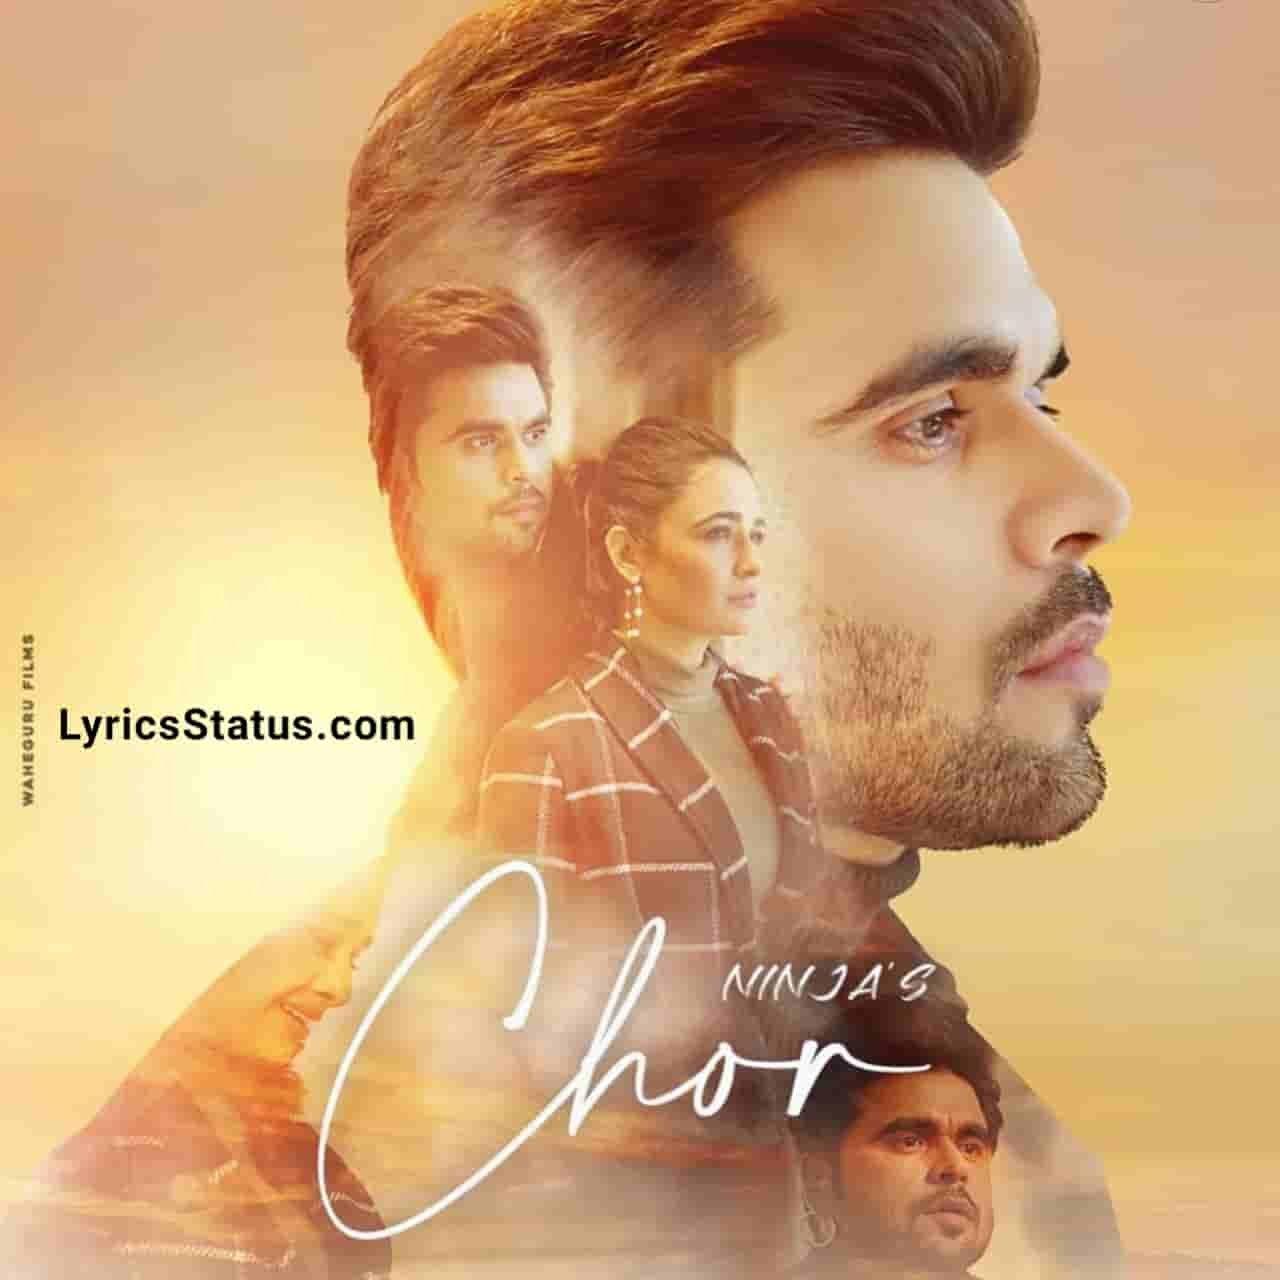 Ninja New Song Chor Lyrics Status Download Punjabi Song Je main nai reh sakdi tere bin Dil tera vi ni laggna status video Black Background Video